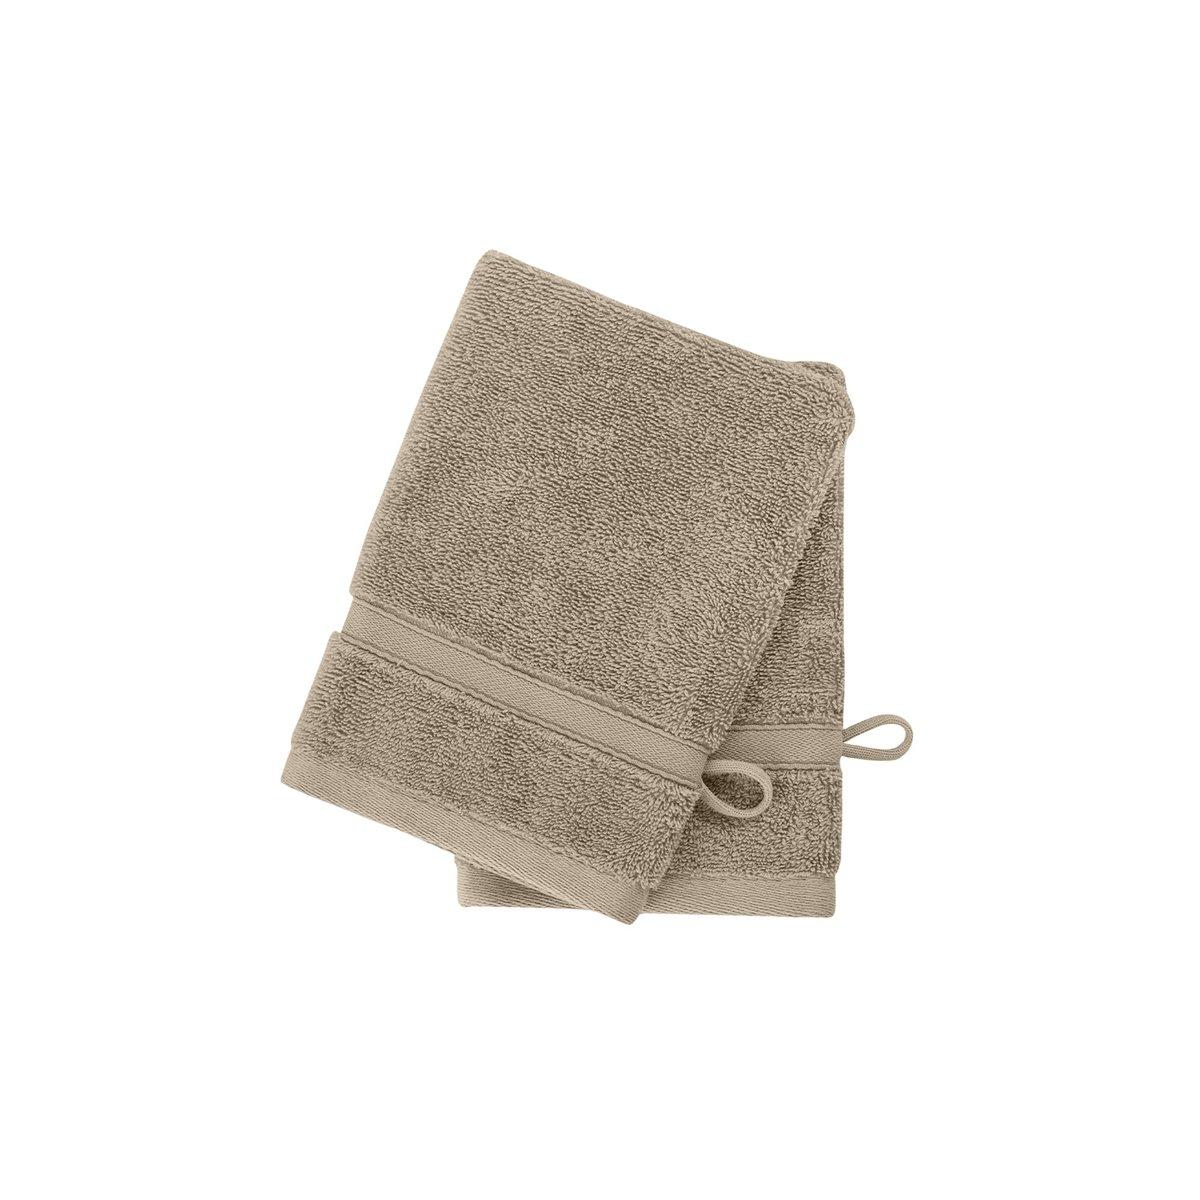 2 gants en coton bio Corde 16x22 cm